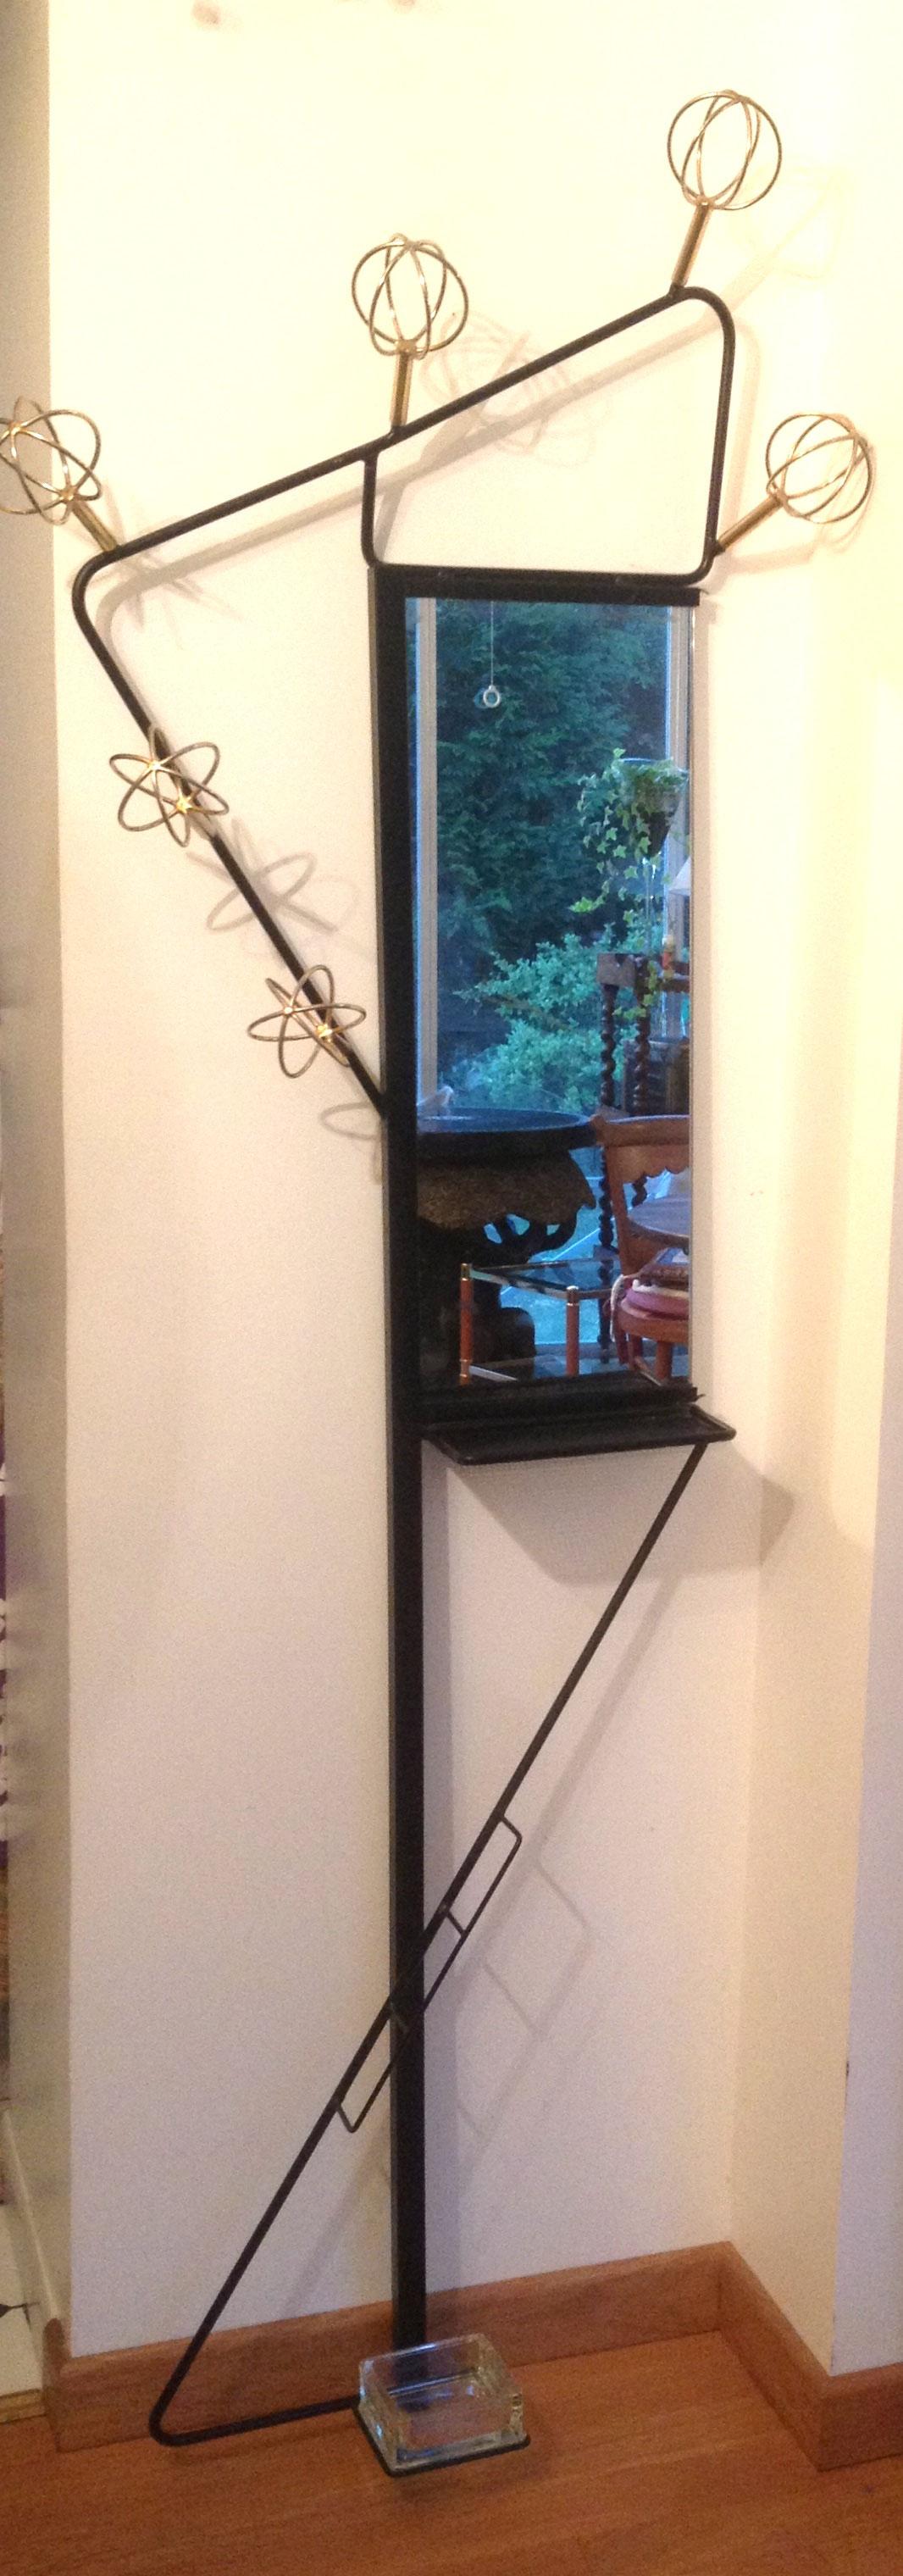 porte manteaux roger feraud ann es 50 galat e galerie. Black Bedroom Furniture Sets. Home Design Ideas